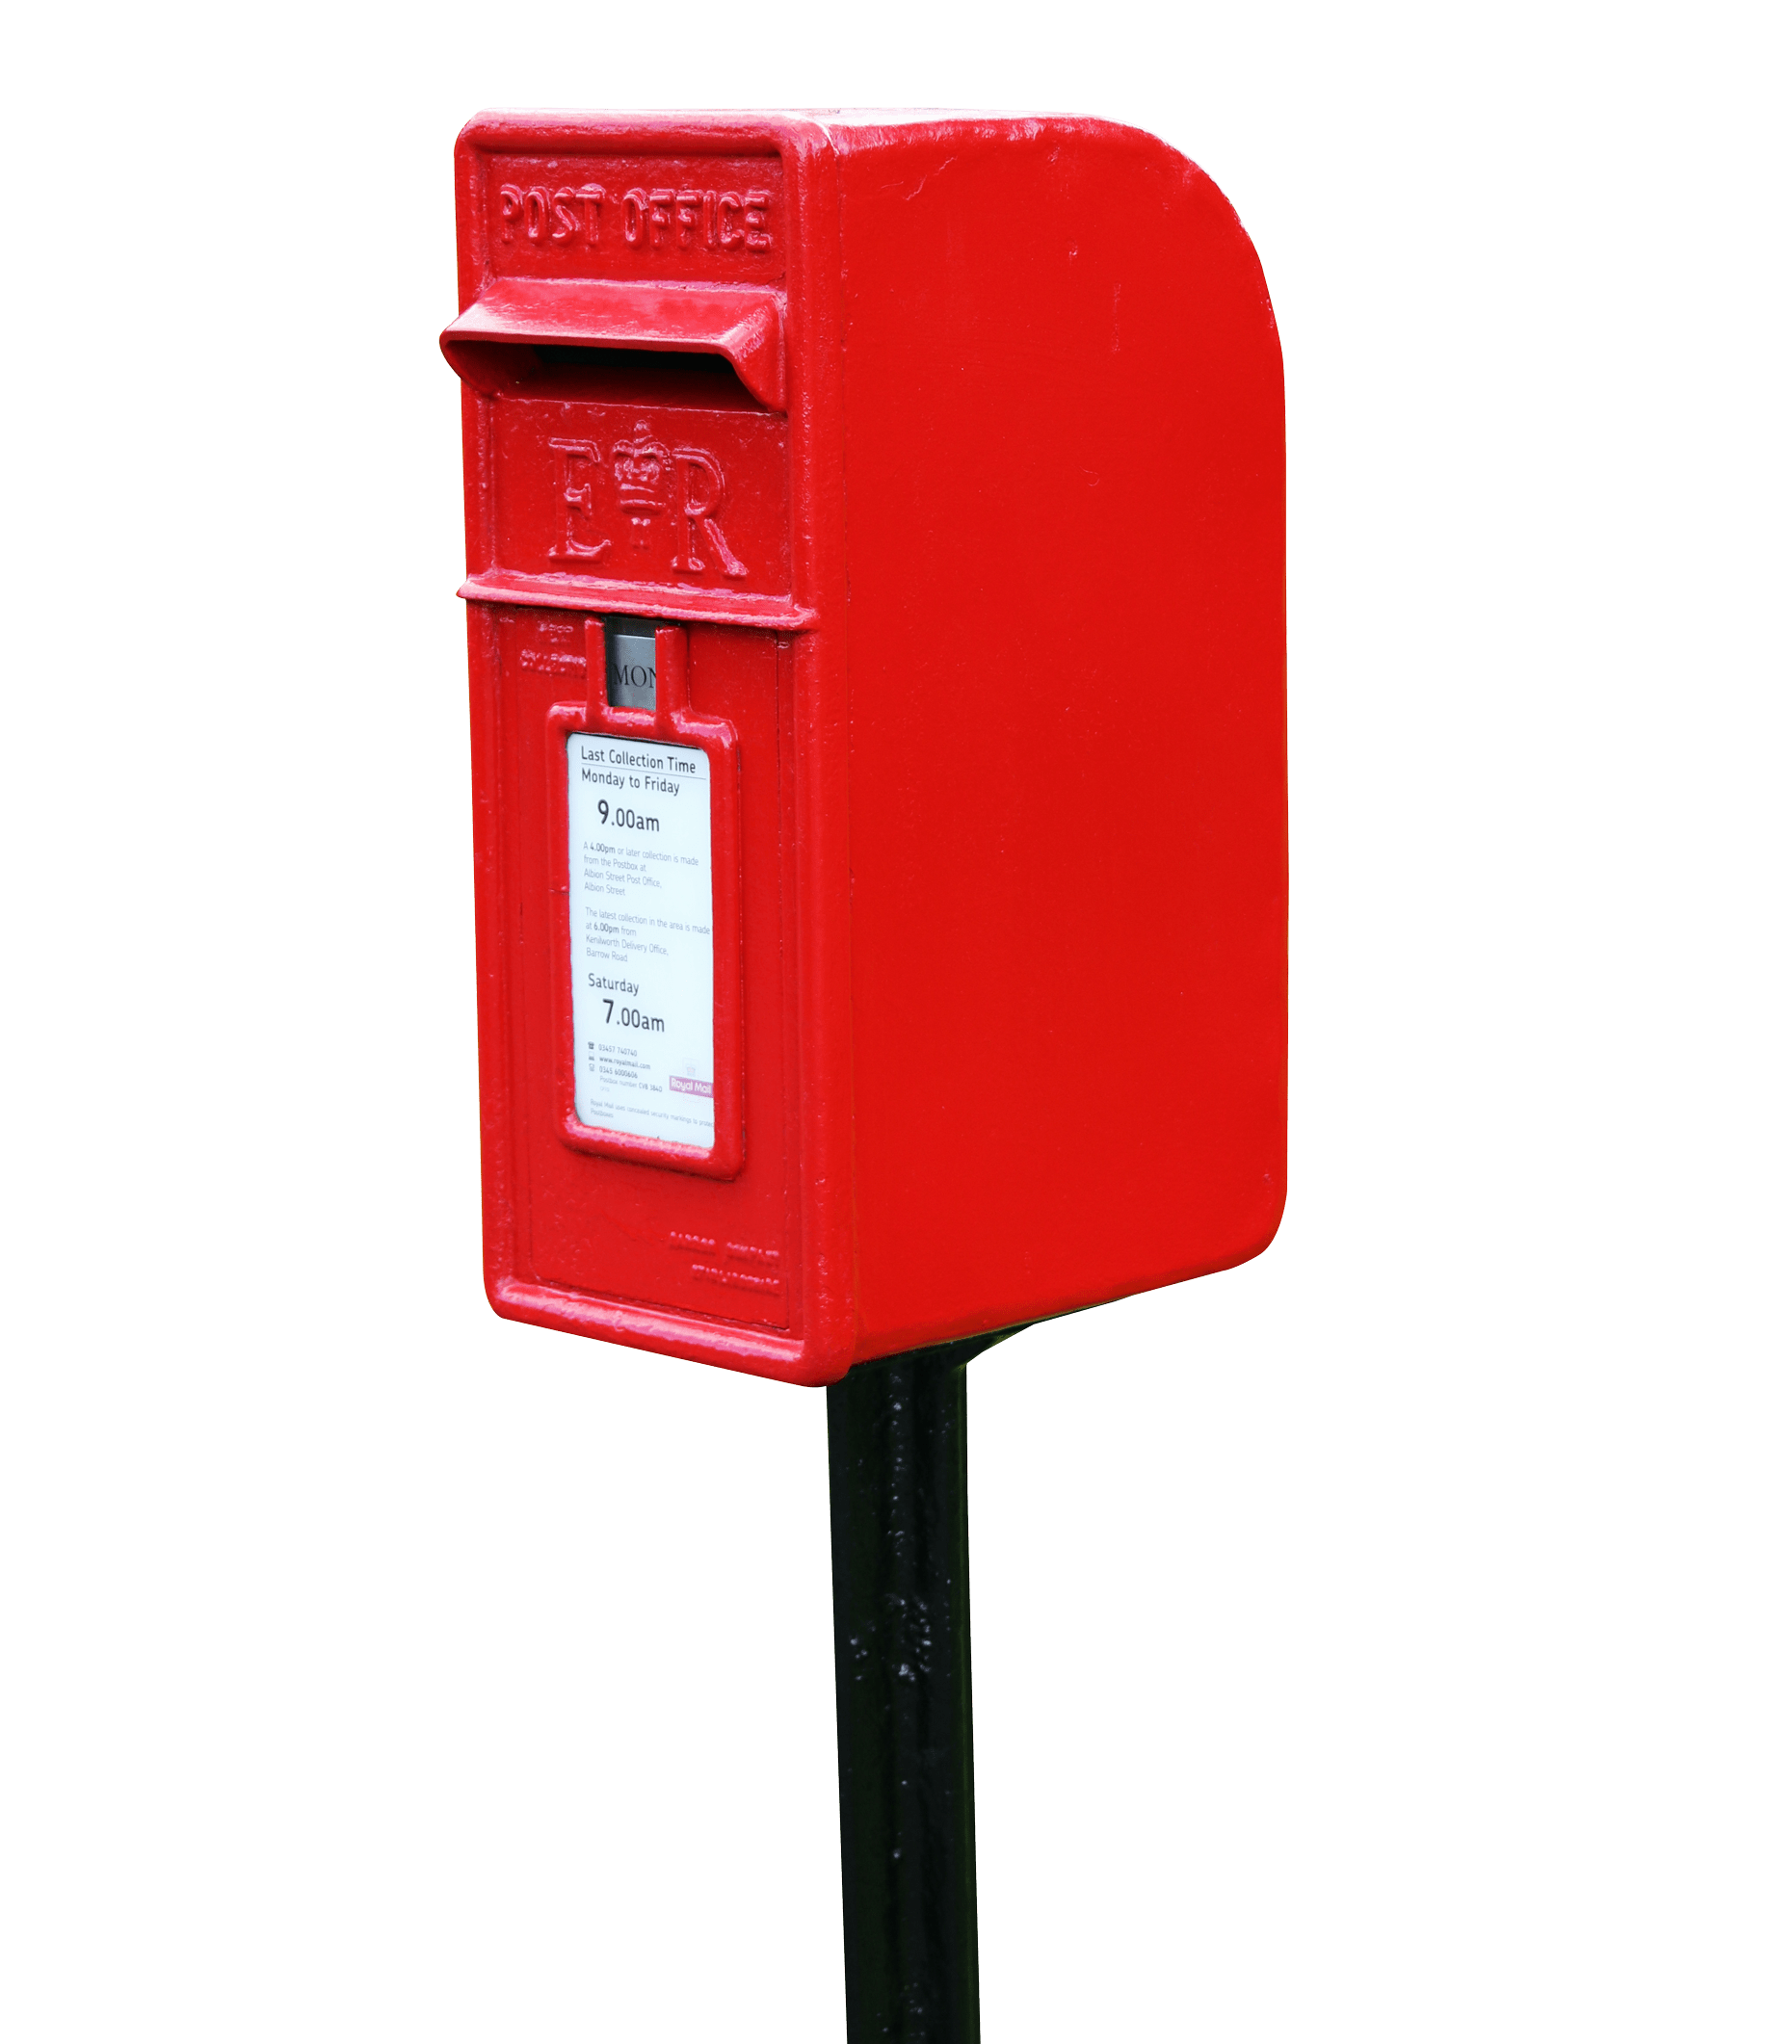 red postbox on stand transparent png stickpng. Black Bedroom Furniture Sets. Home Design Ideas